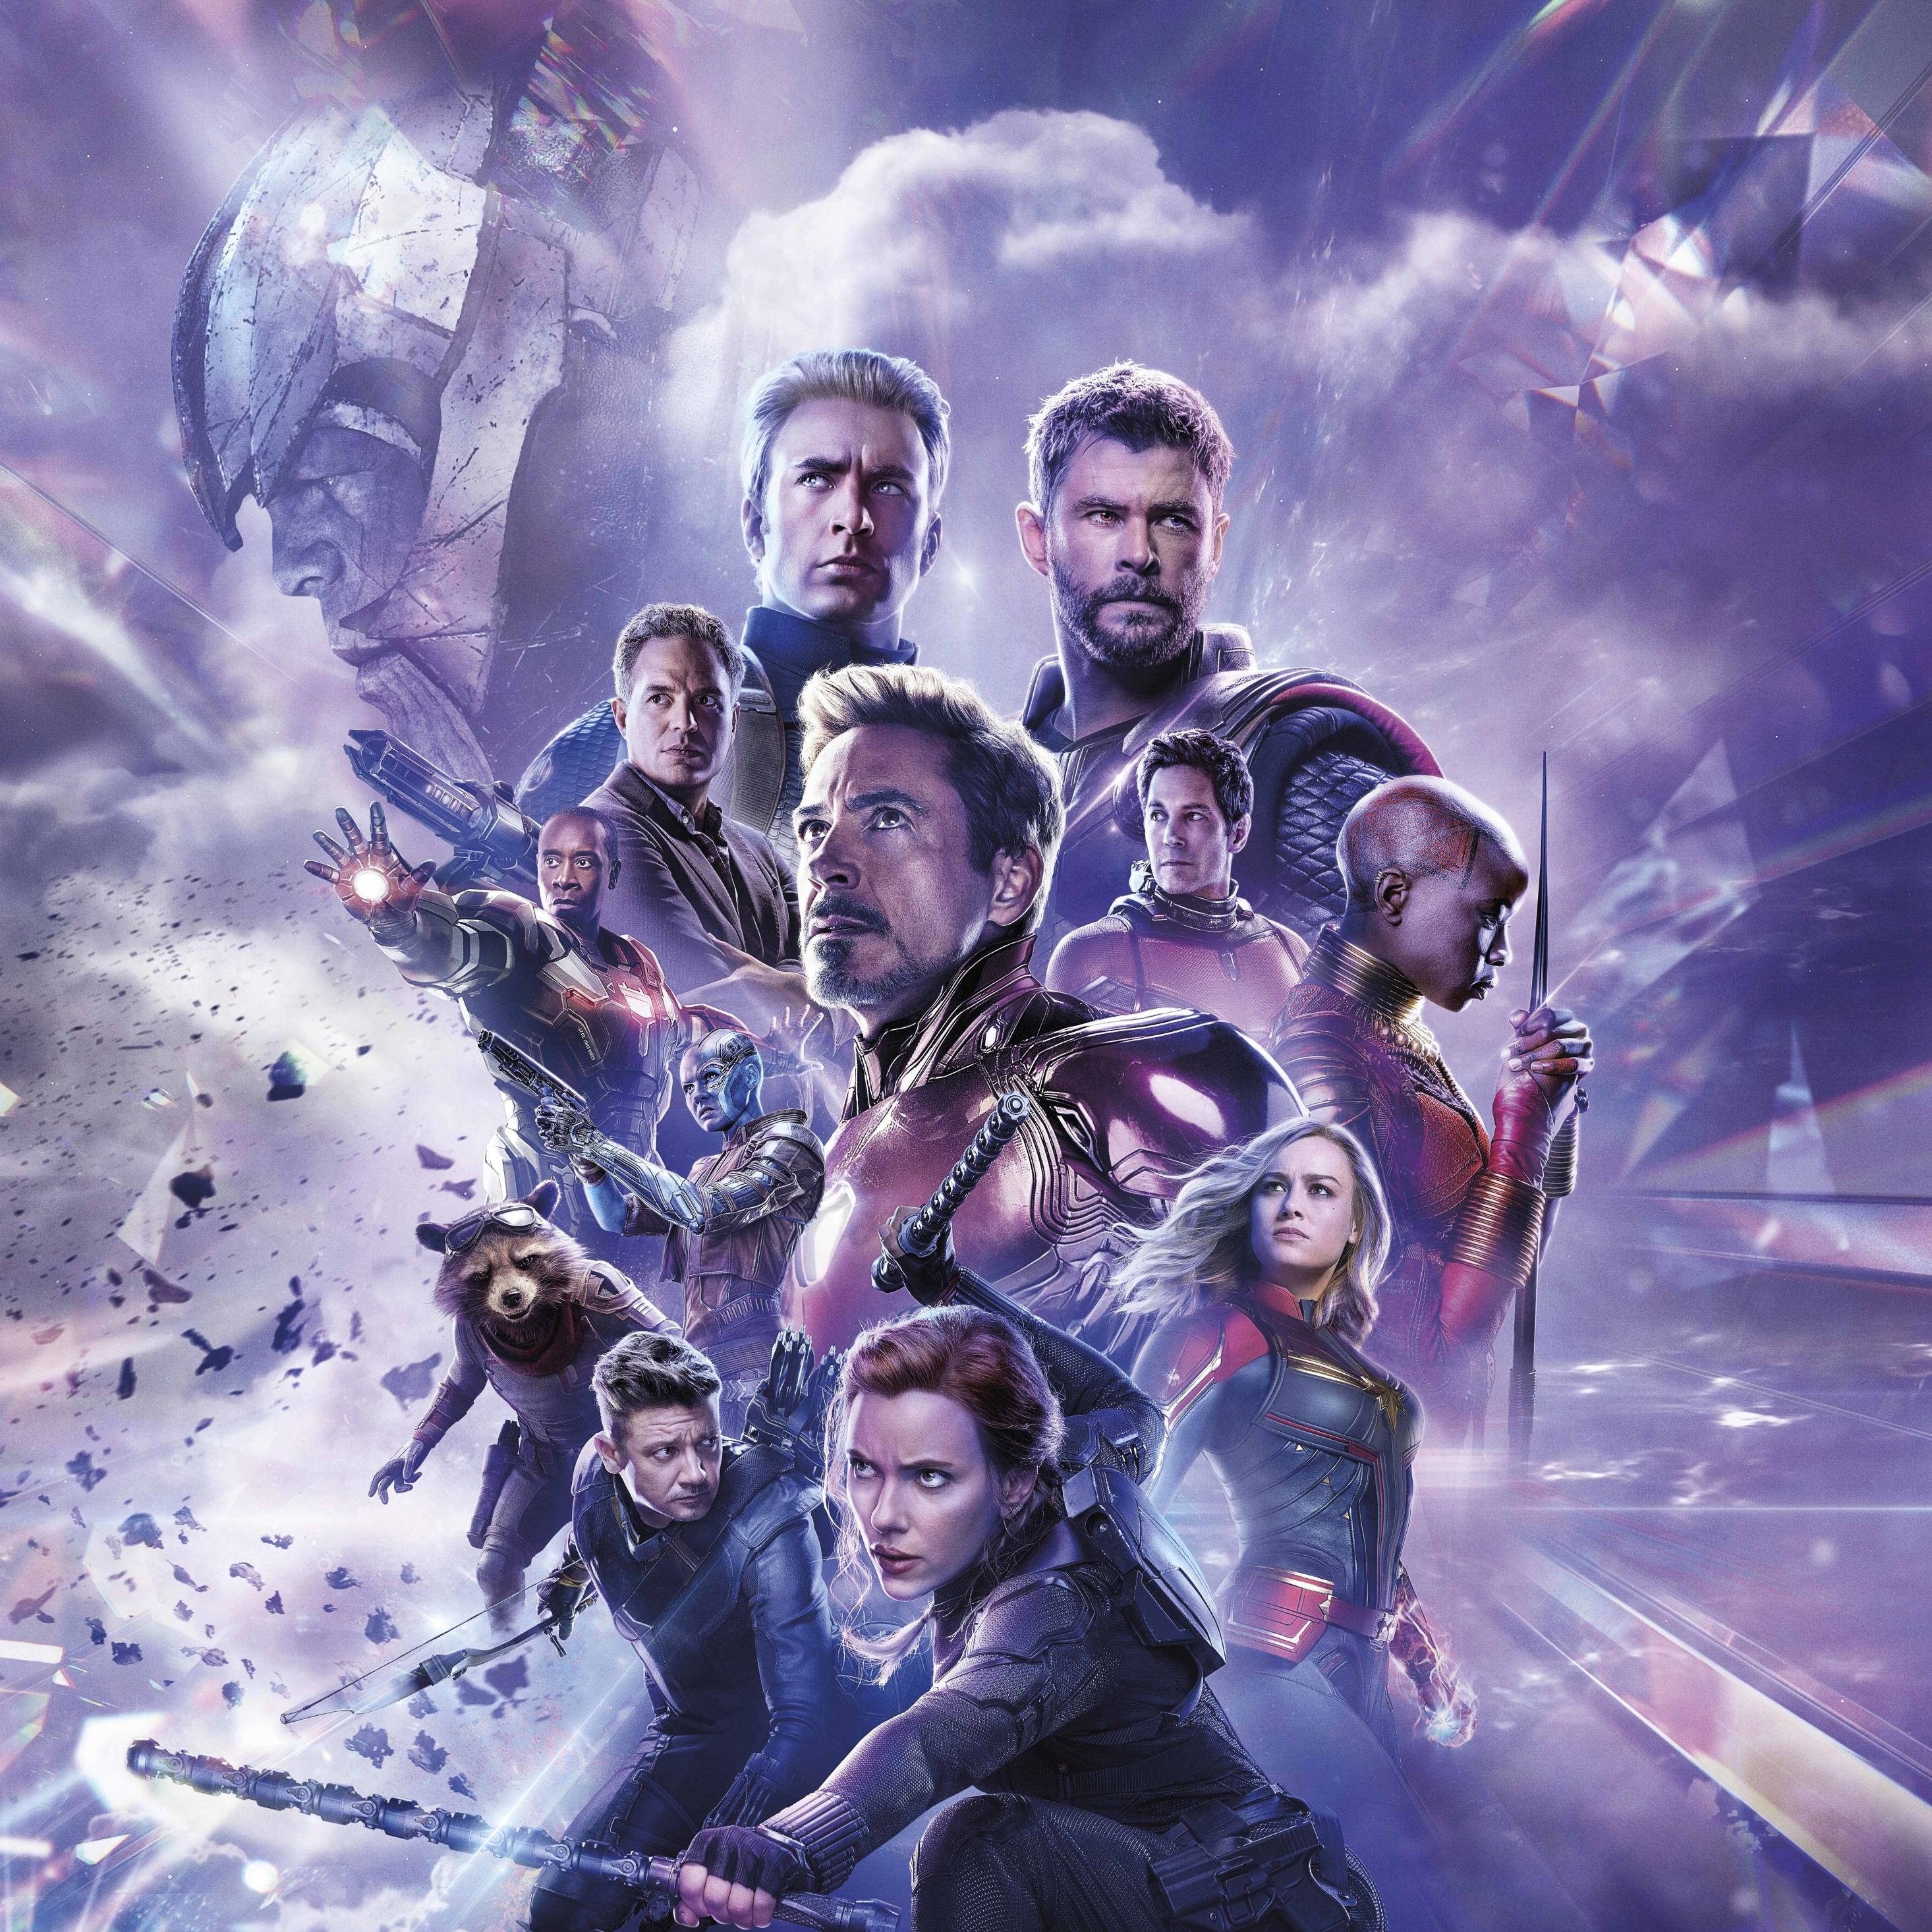 2932x2932 Avengers Endgame 8K Russian Poster Ipad Pro